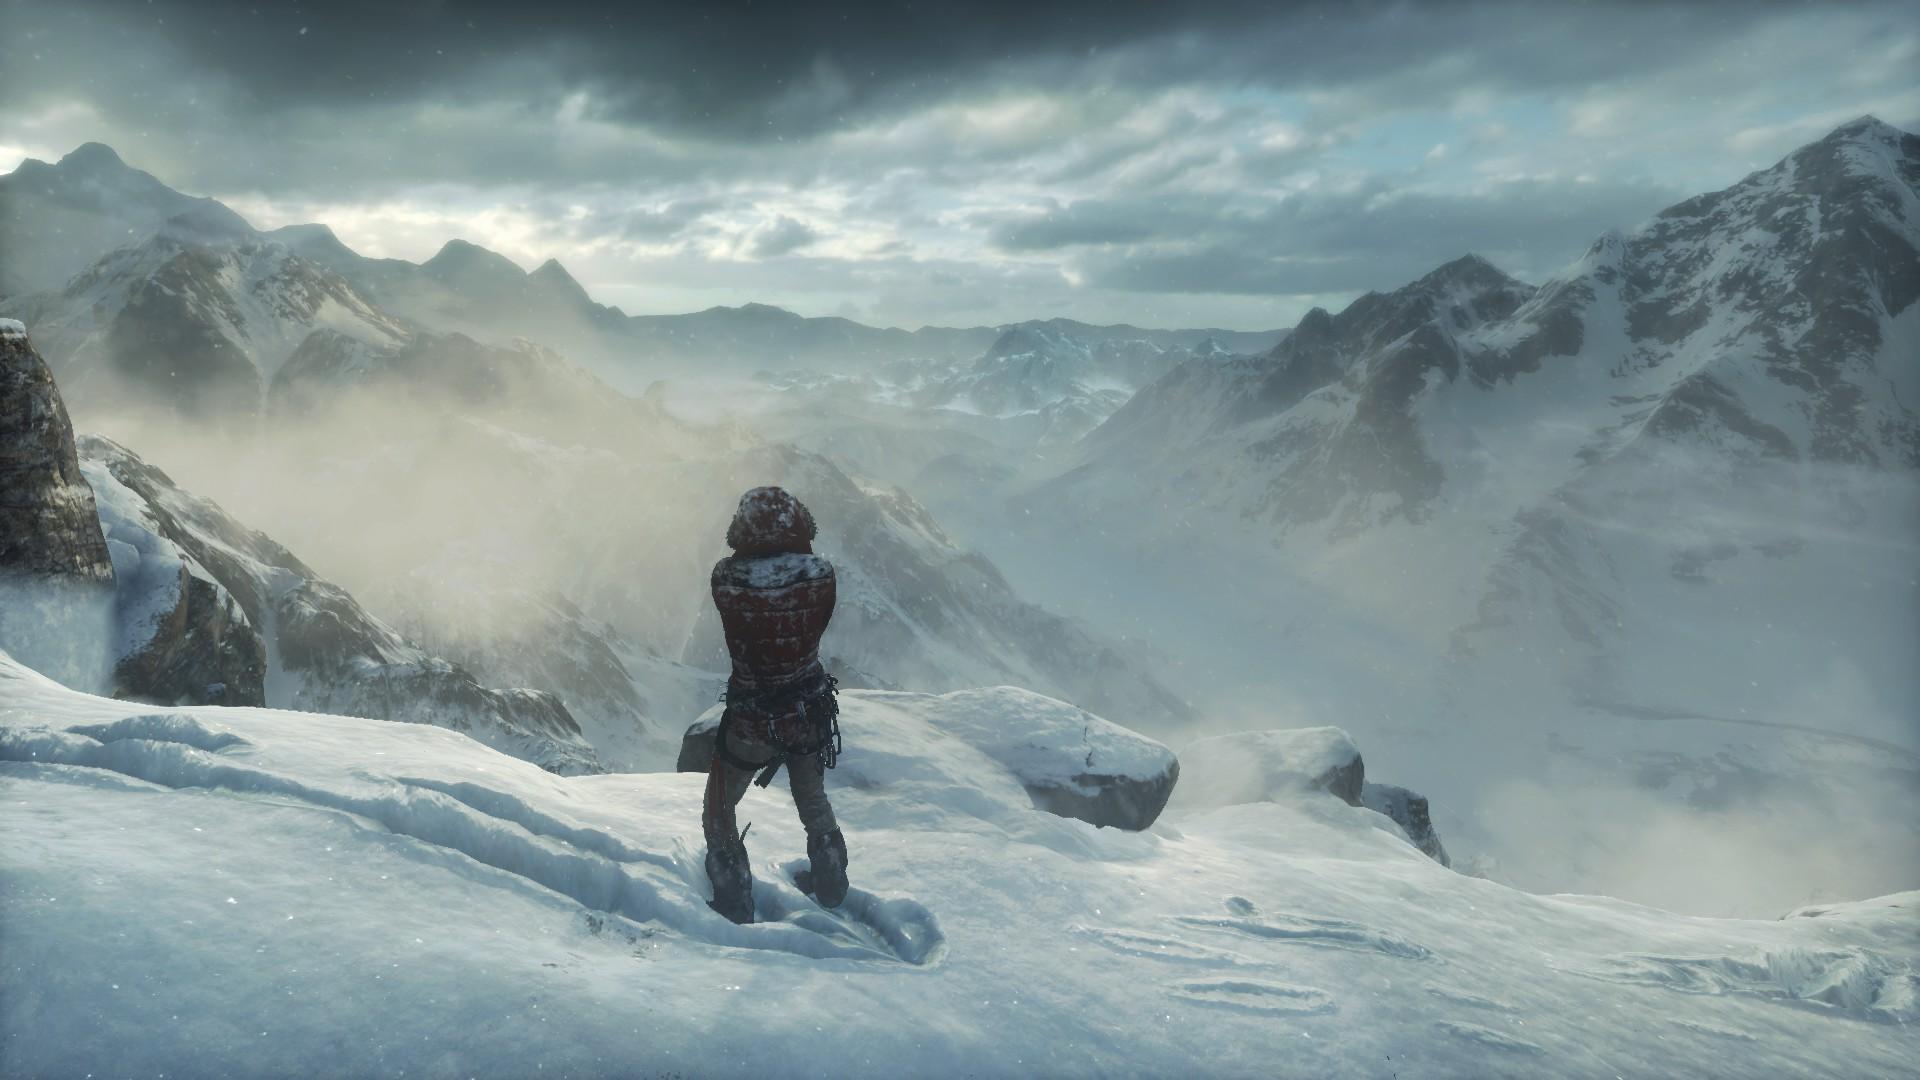 20171203194513_1.jpg - Rise of the Tomb Raider